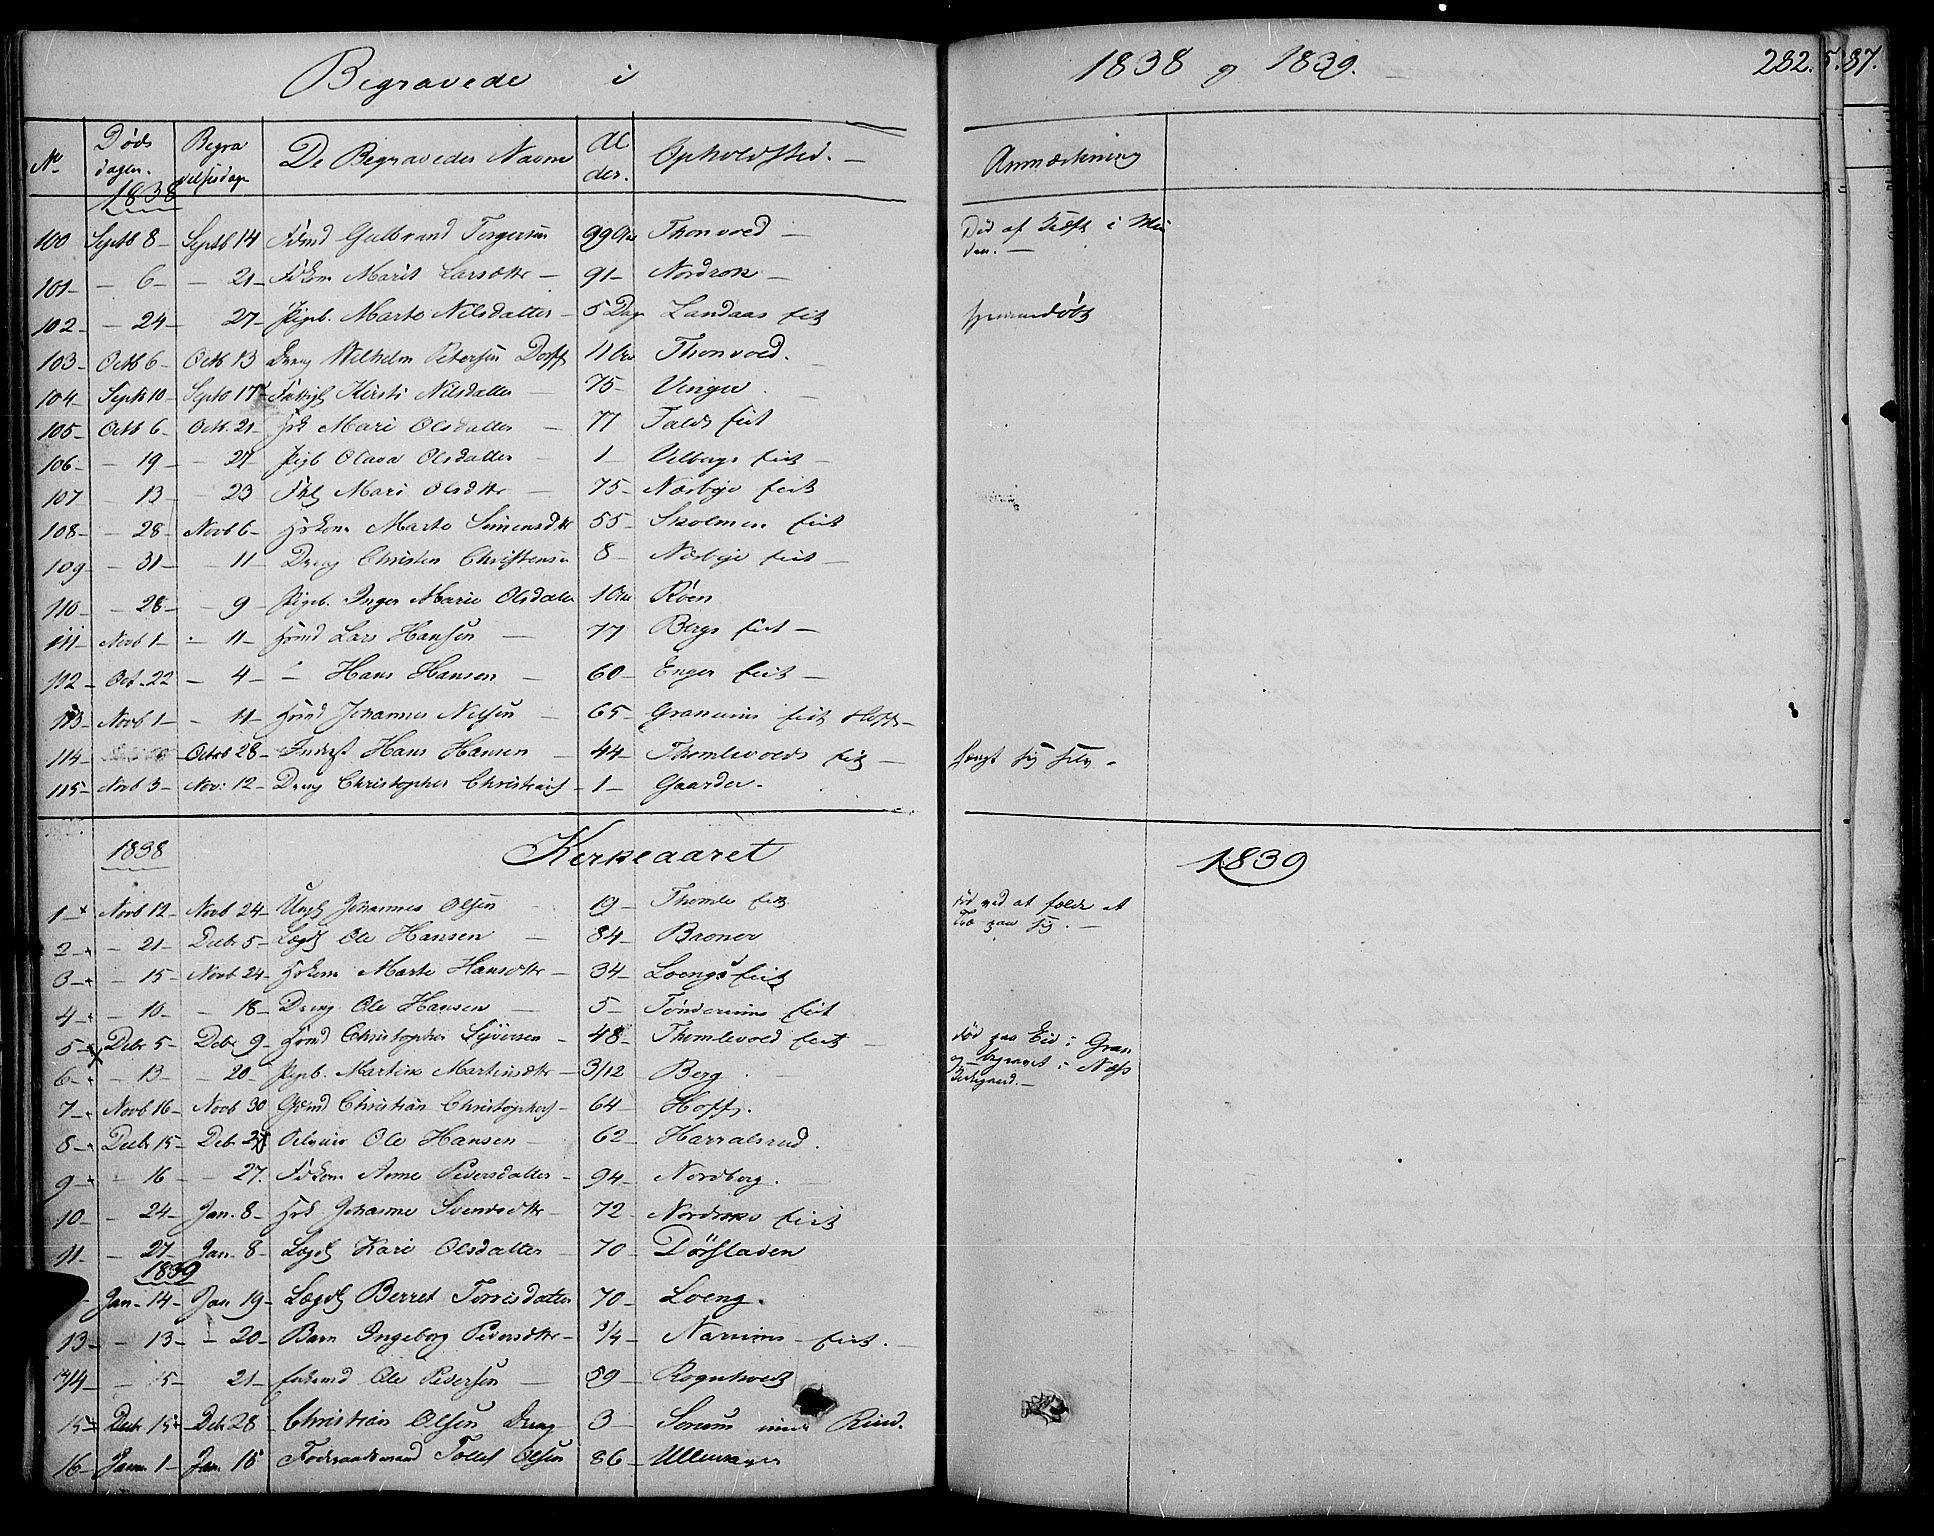 SAH, Land prestekontor, Ministerialbok nr. 8, 1830-1846, s. 282